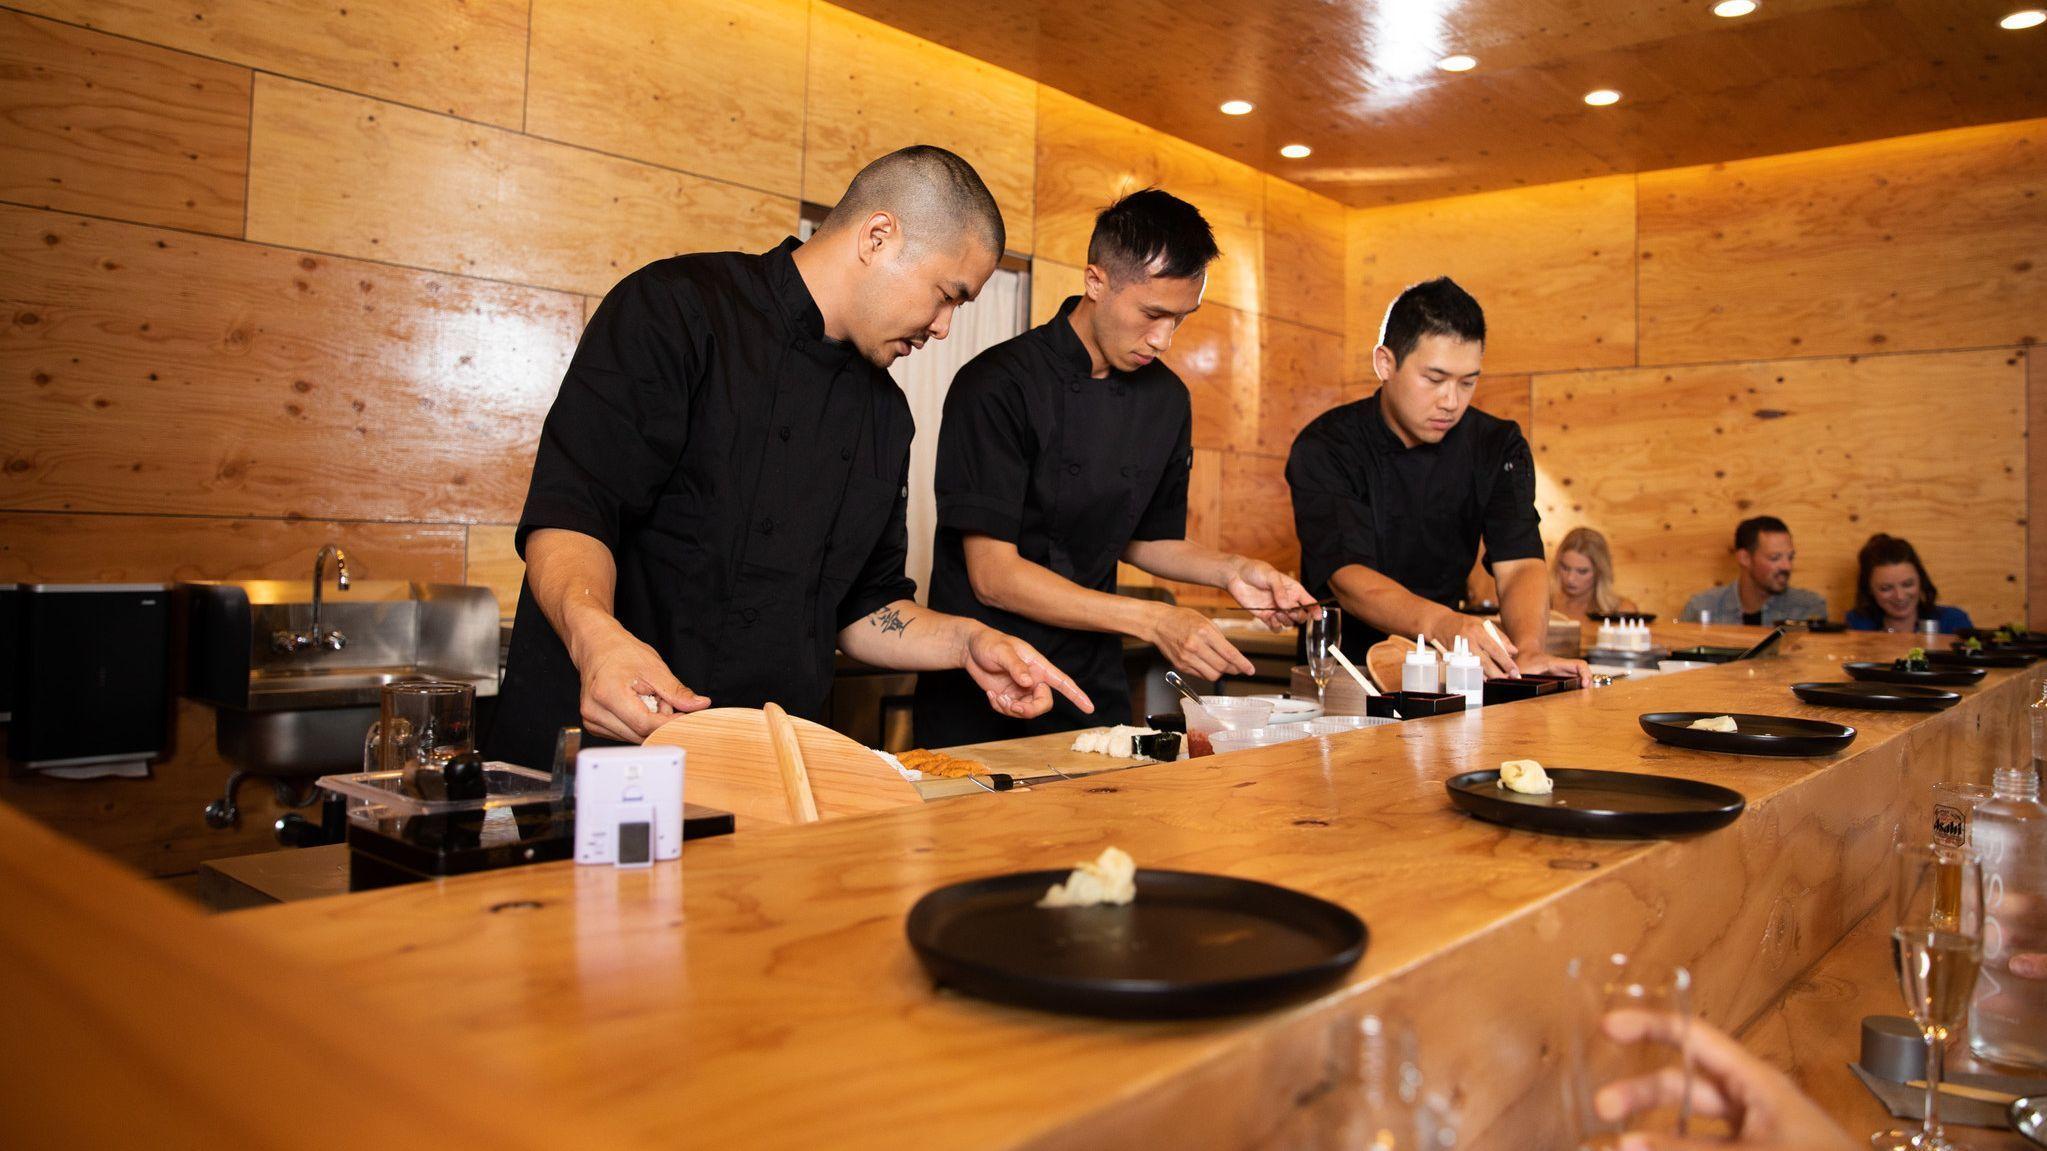 All-omakase Hidden Fish sushi not so secret anymore